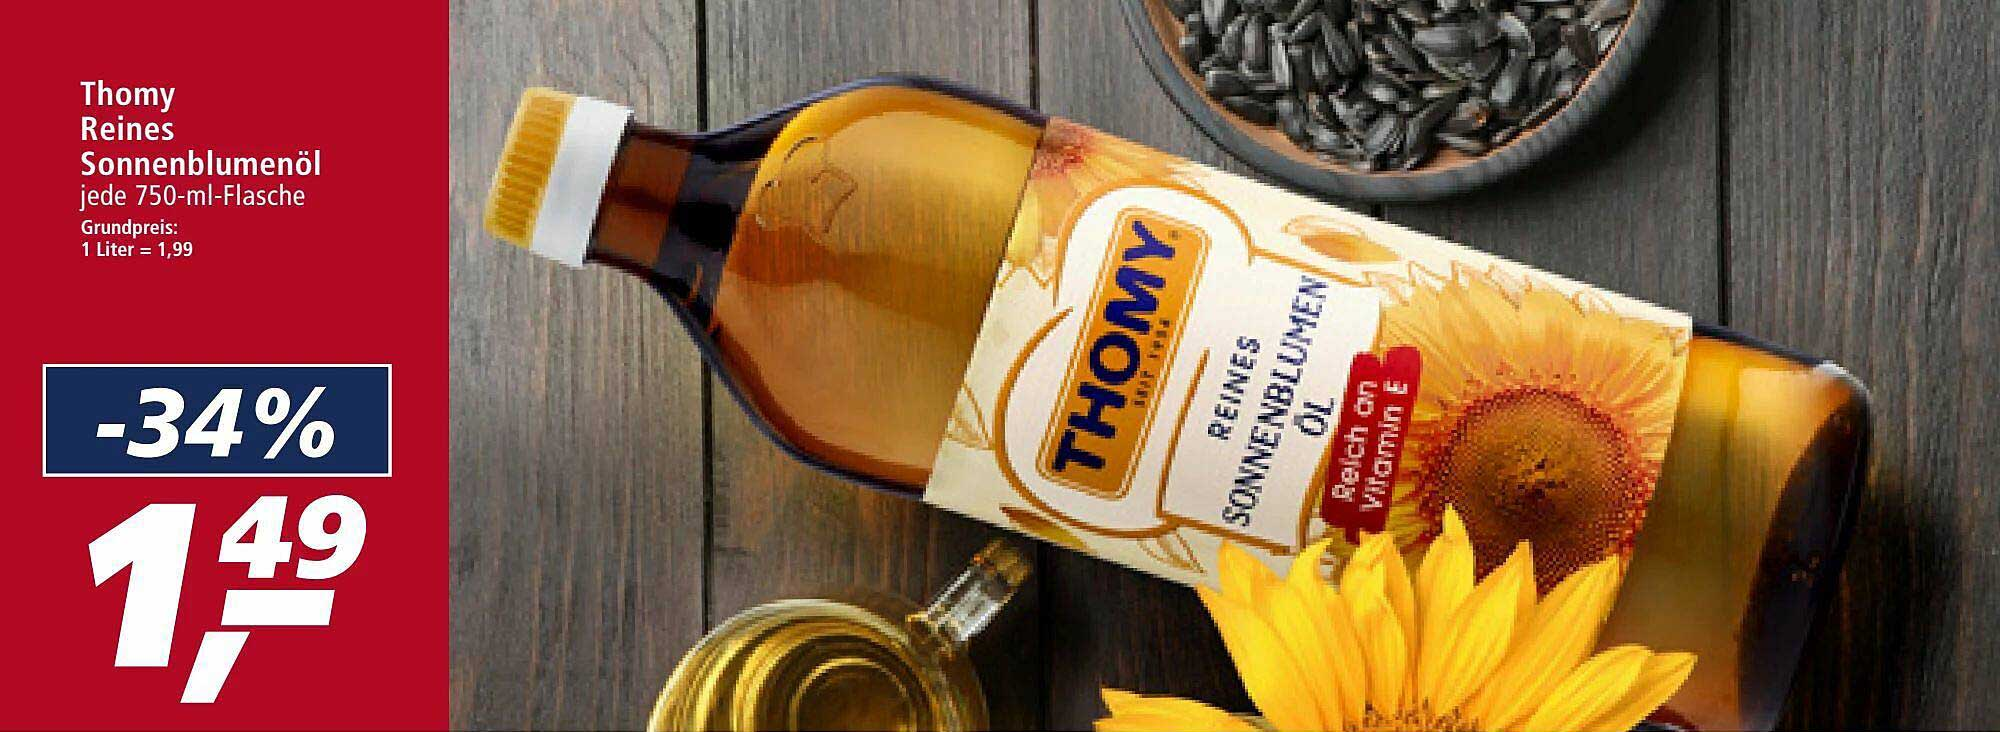 Real Thomy Reines Sonnenblumenöl